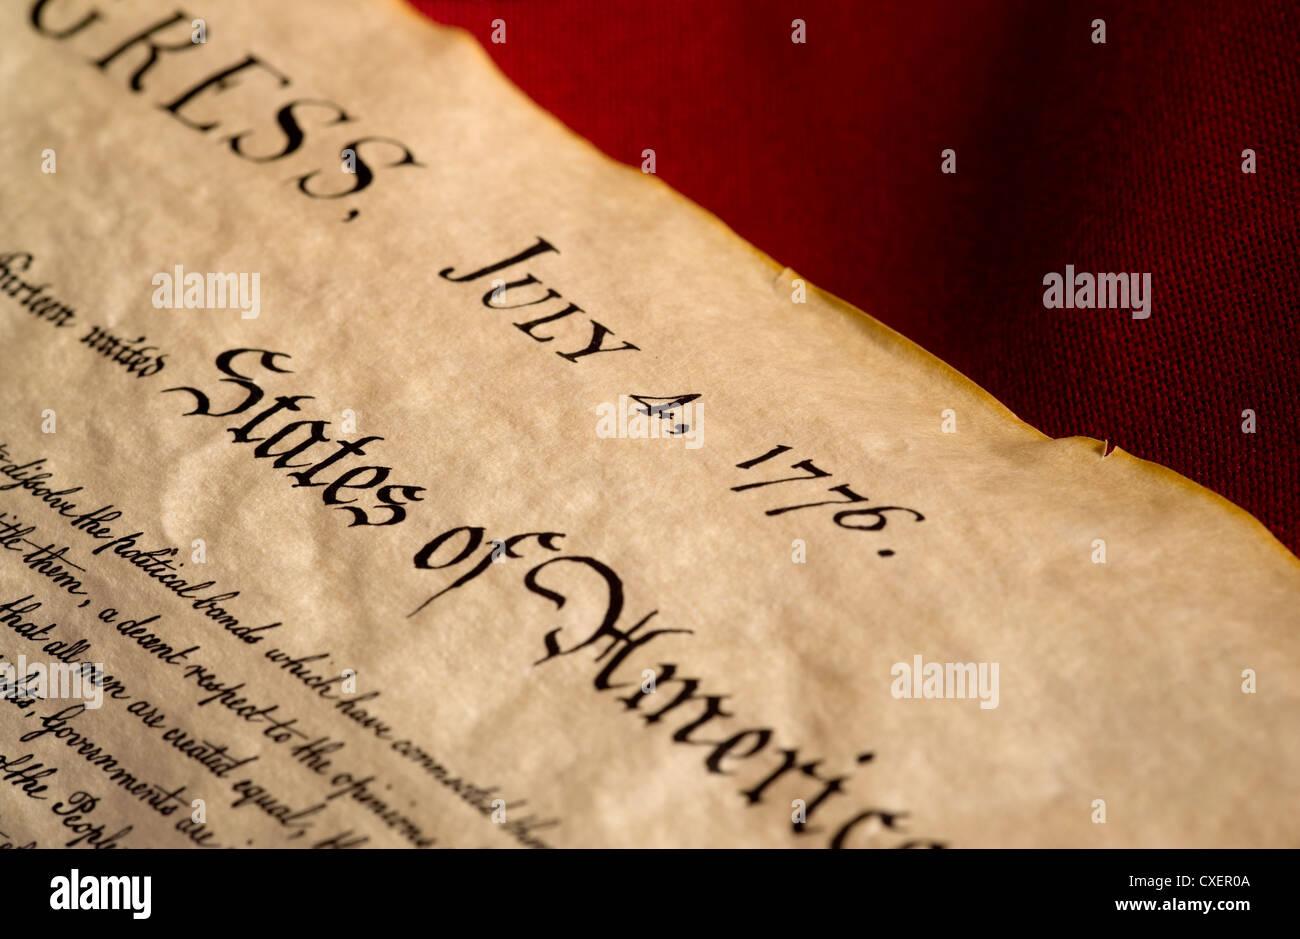 United States Declaration of Independence document - Stock Image